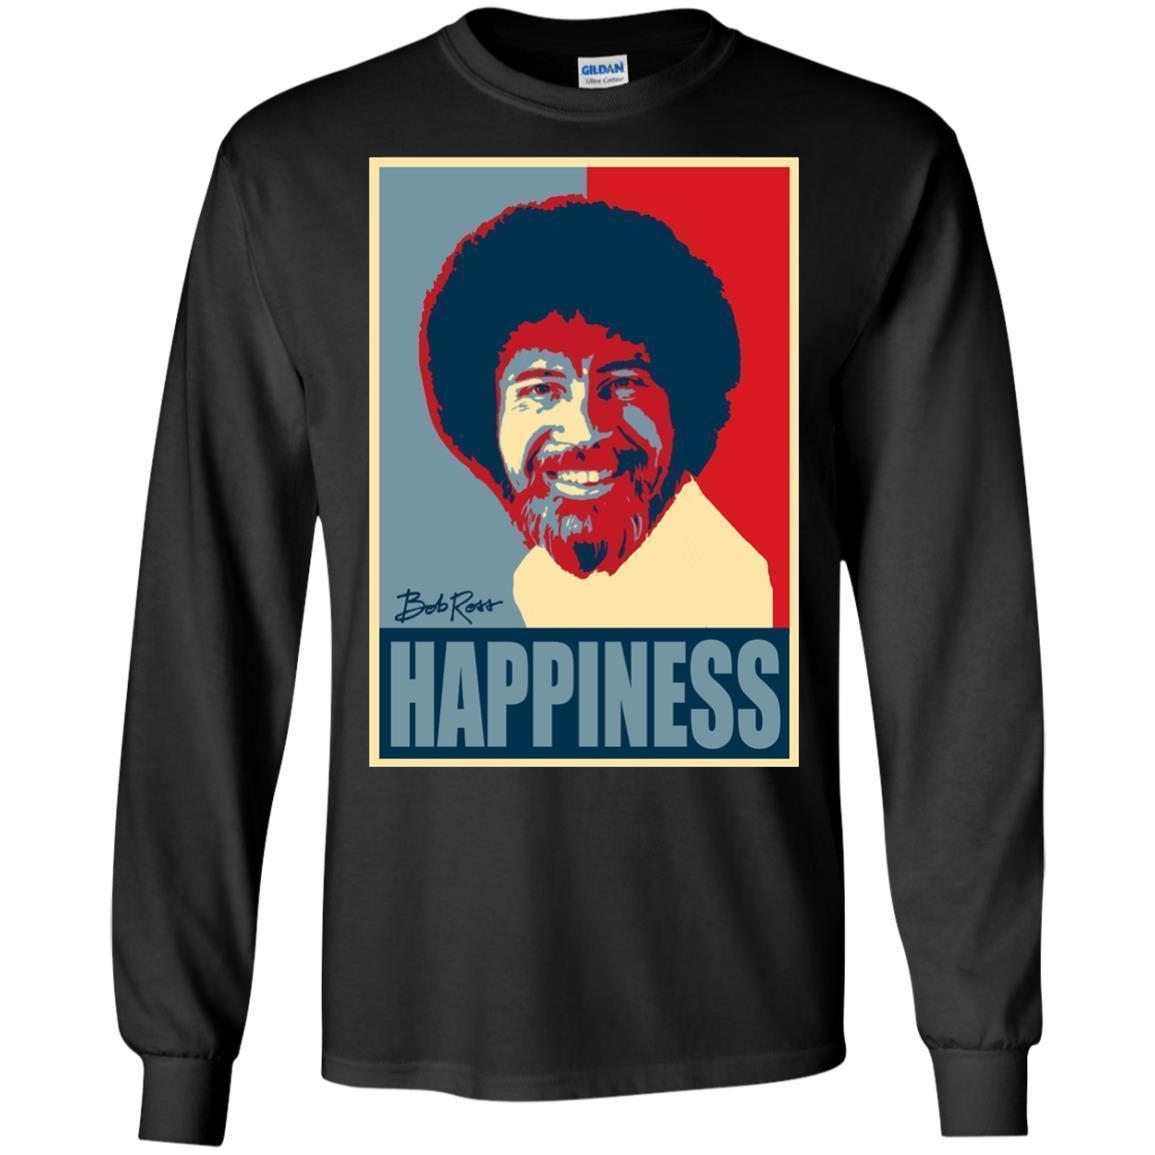 Bob Painter Ross Happiness Shirt